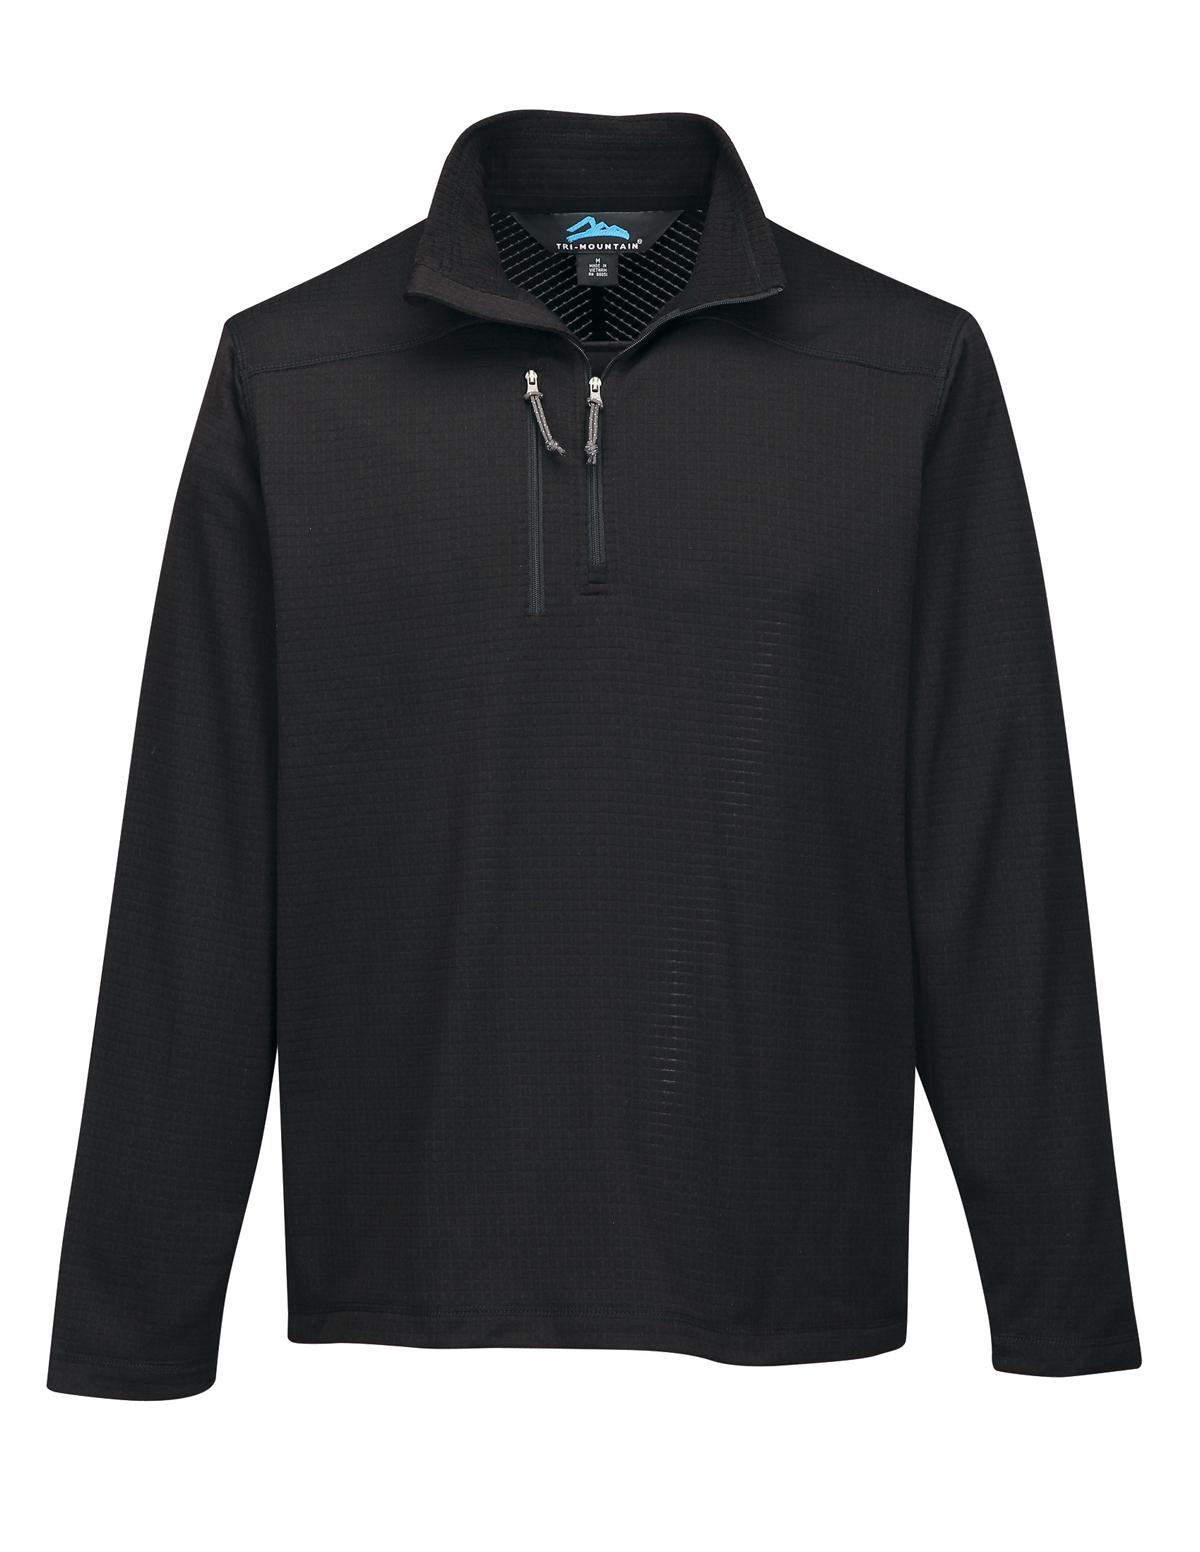 Tri-Mountain Tenzig F7636 Pullover Reverse Plaid Fleece, 2X-Large, Black